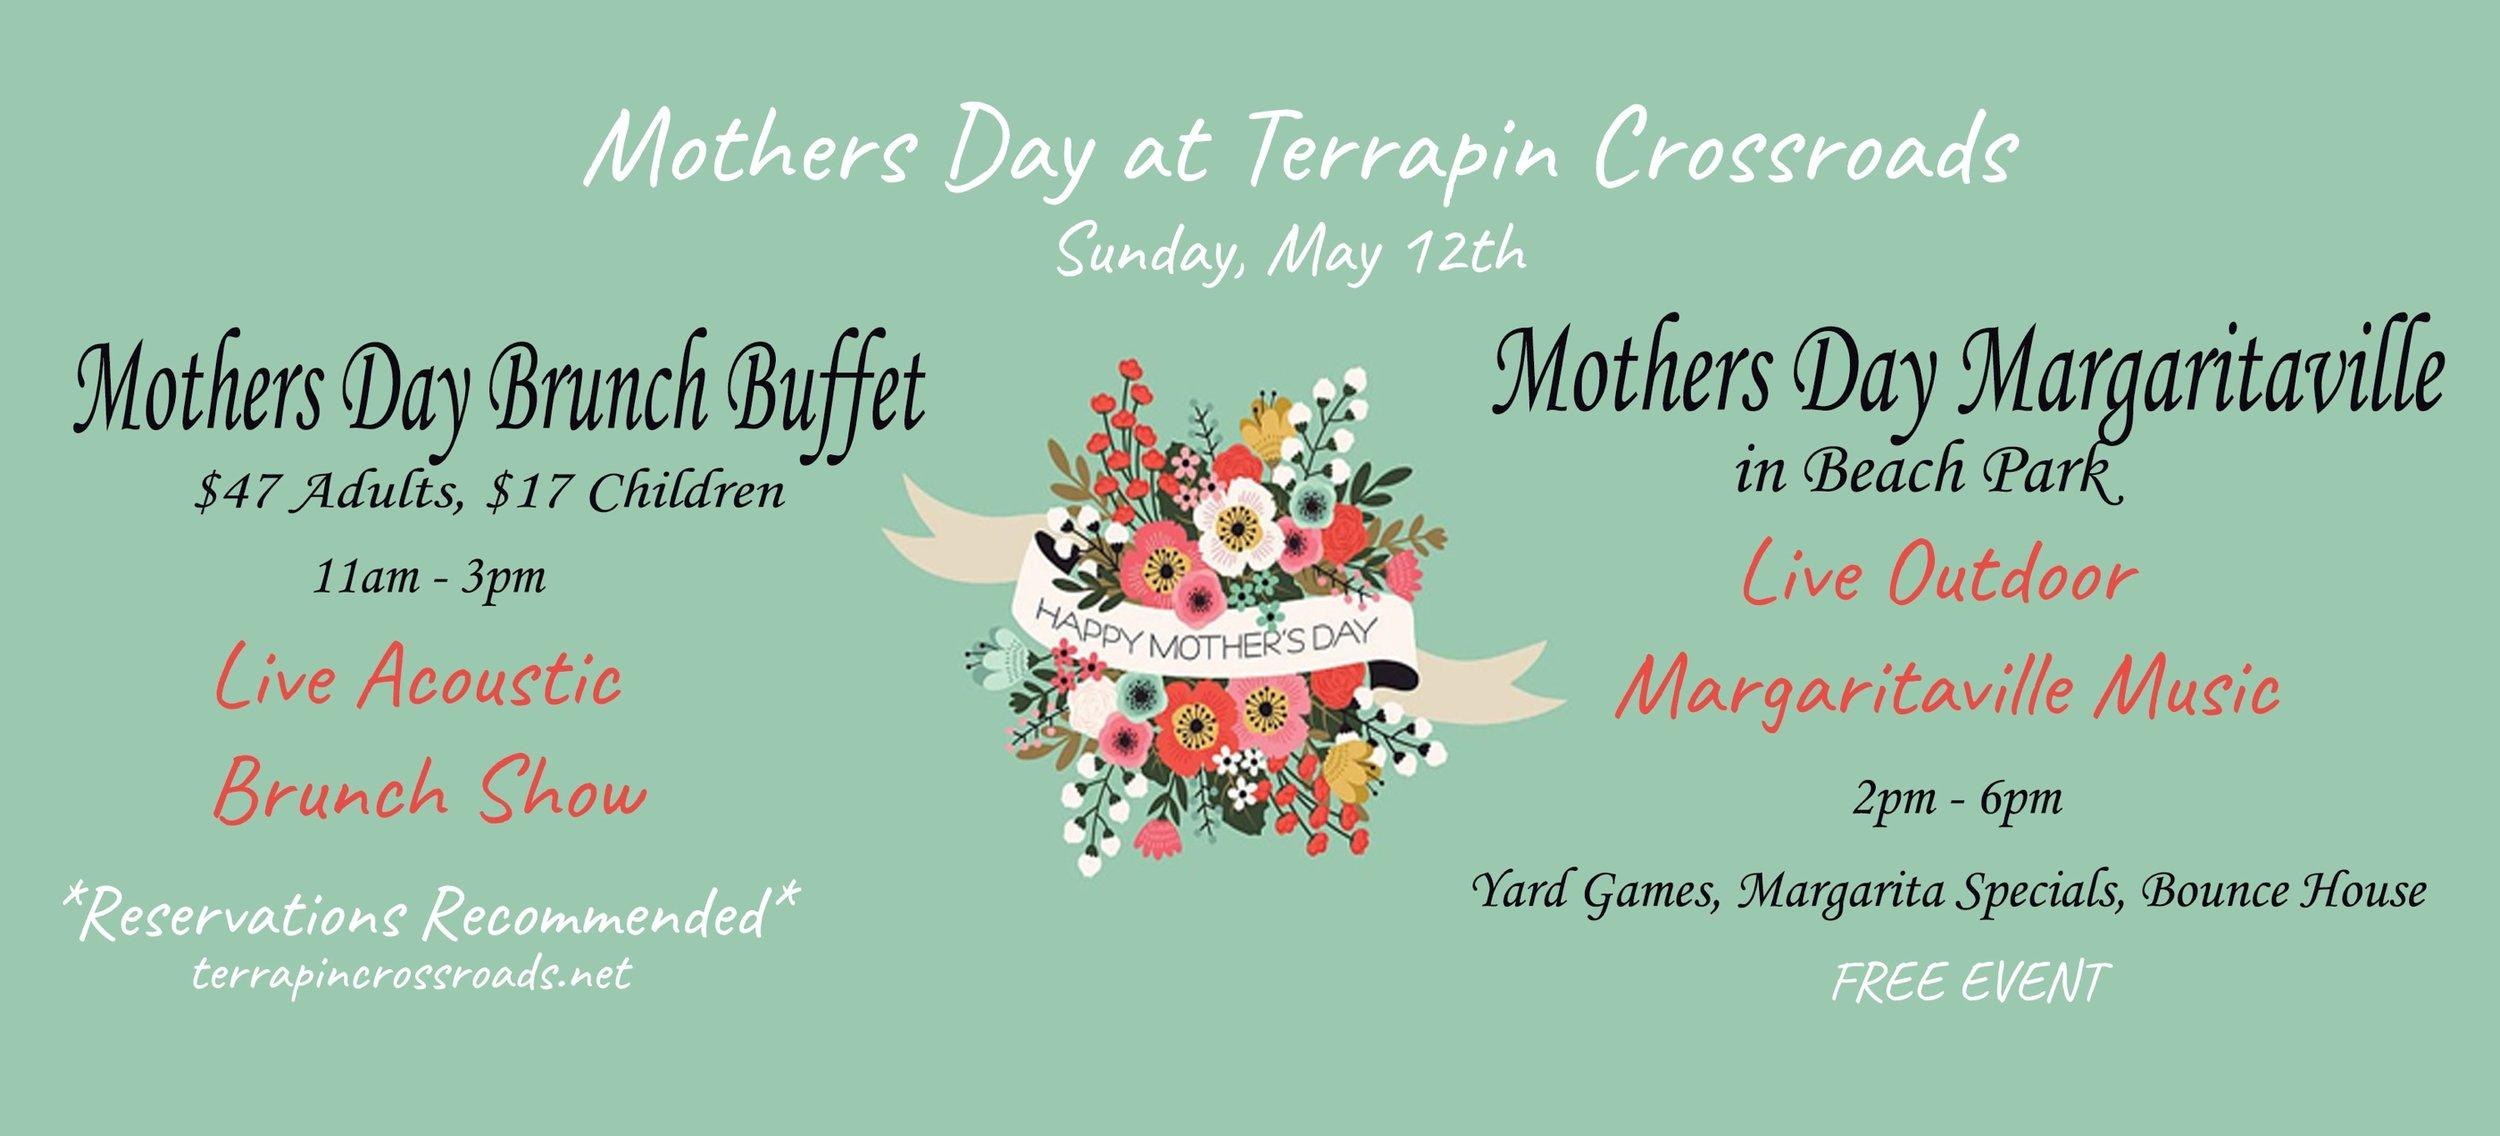 mothersday2019.jpg-1.jpeg